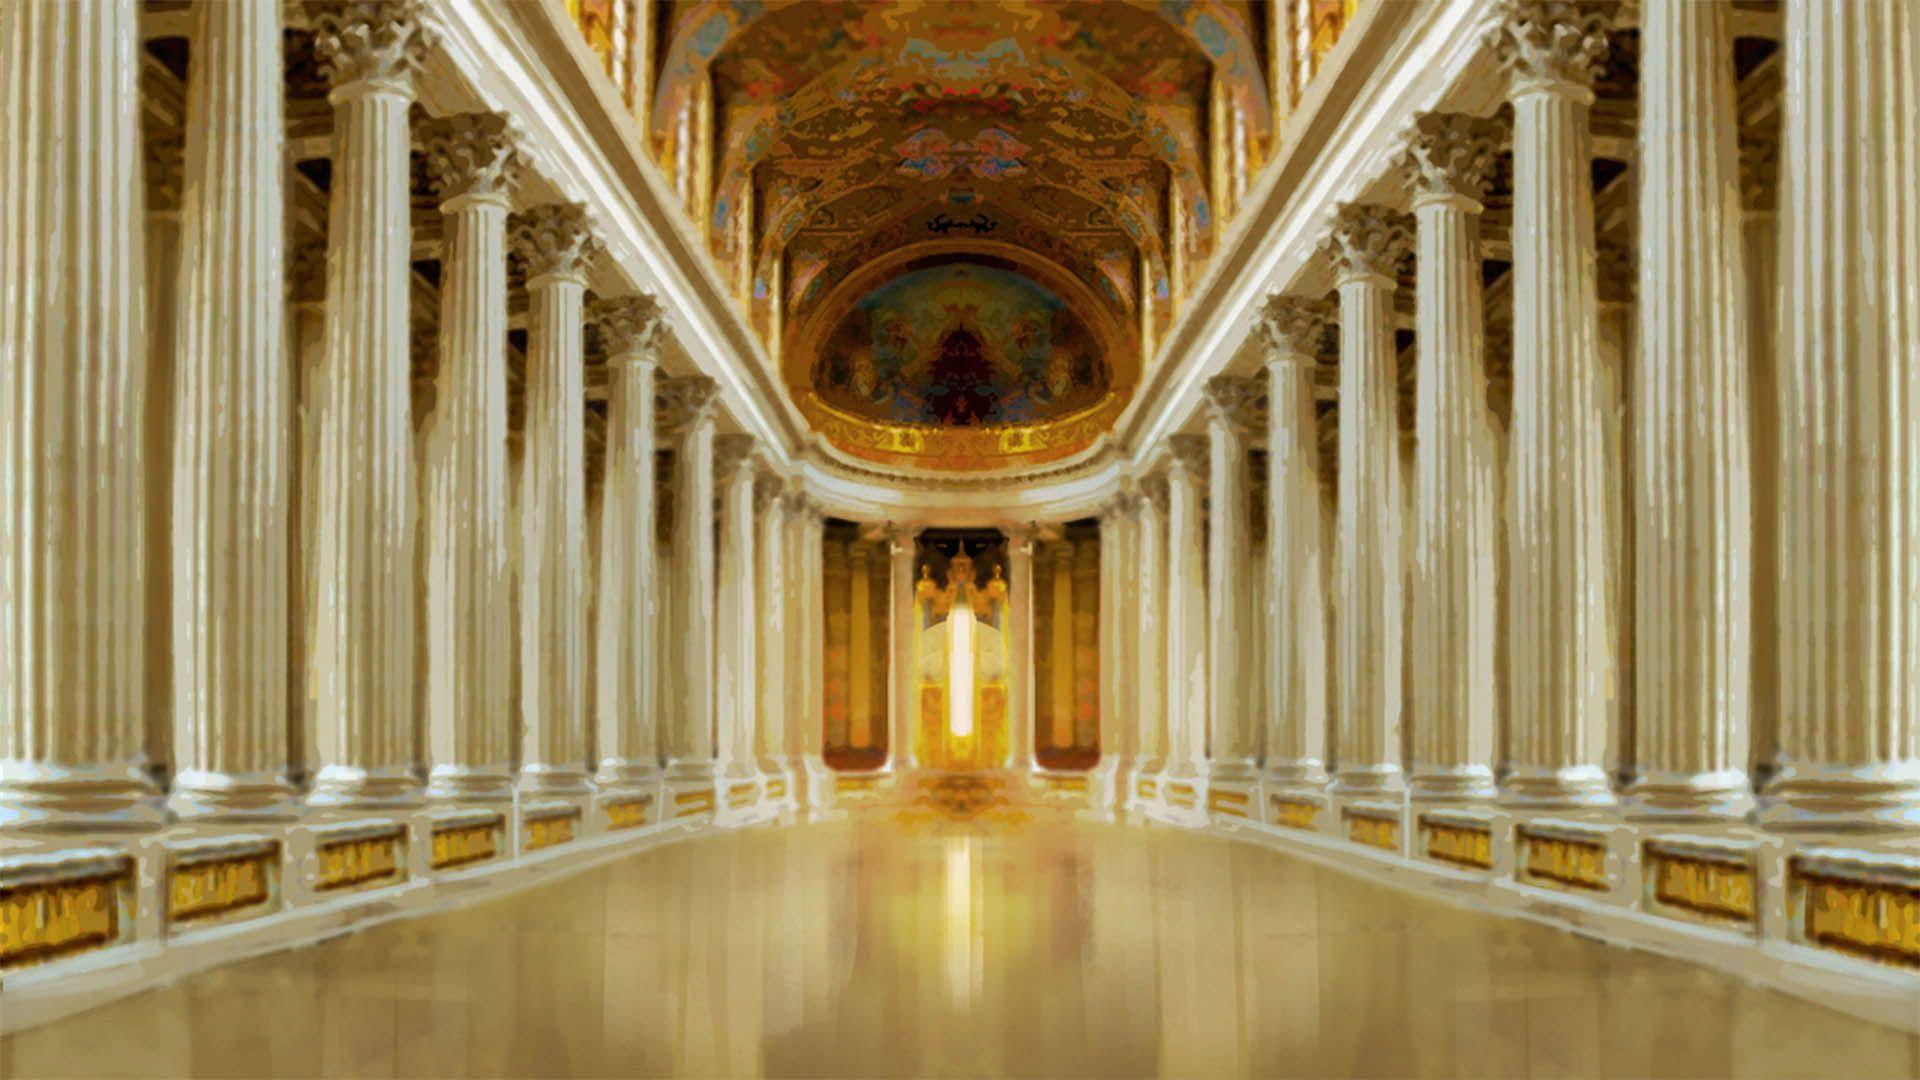 Photoshop Backgrounds of Royal Palace